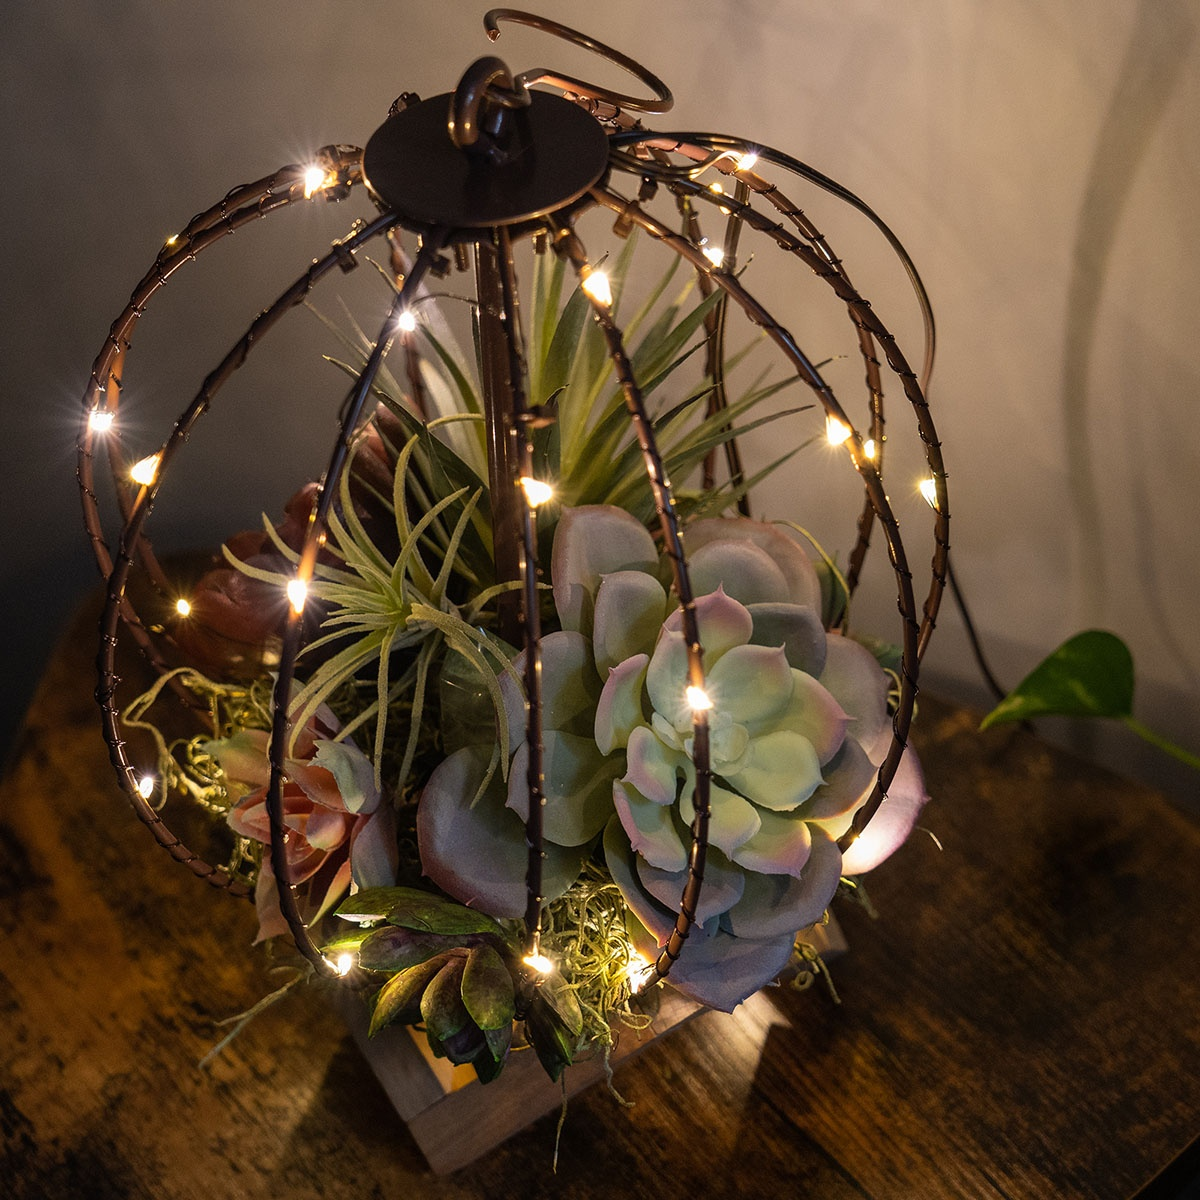 DIY Terrarium Light Ball With Succulents